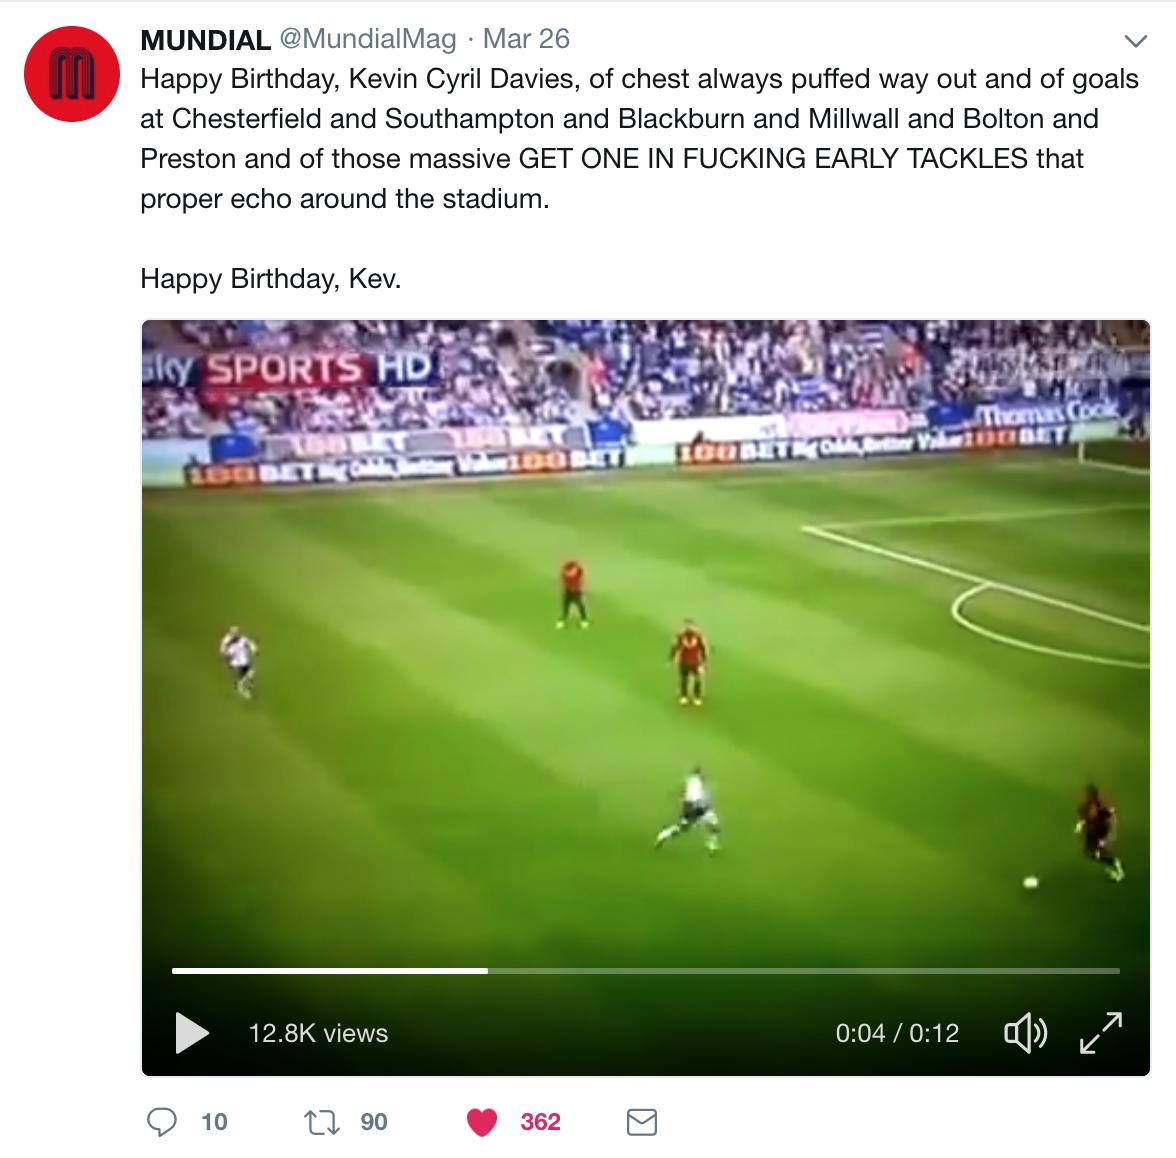 Mundial - Football culture